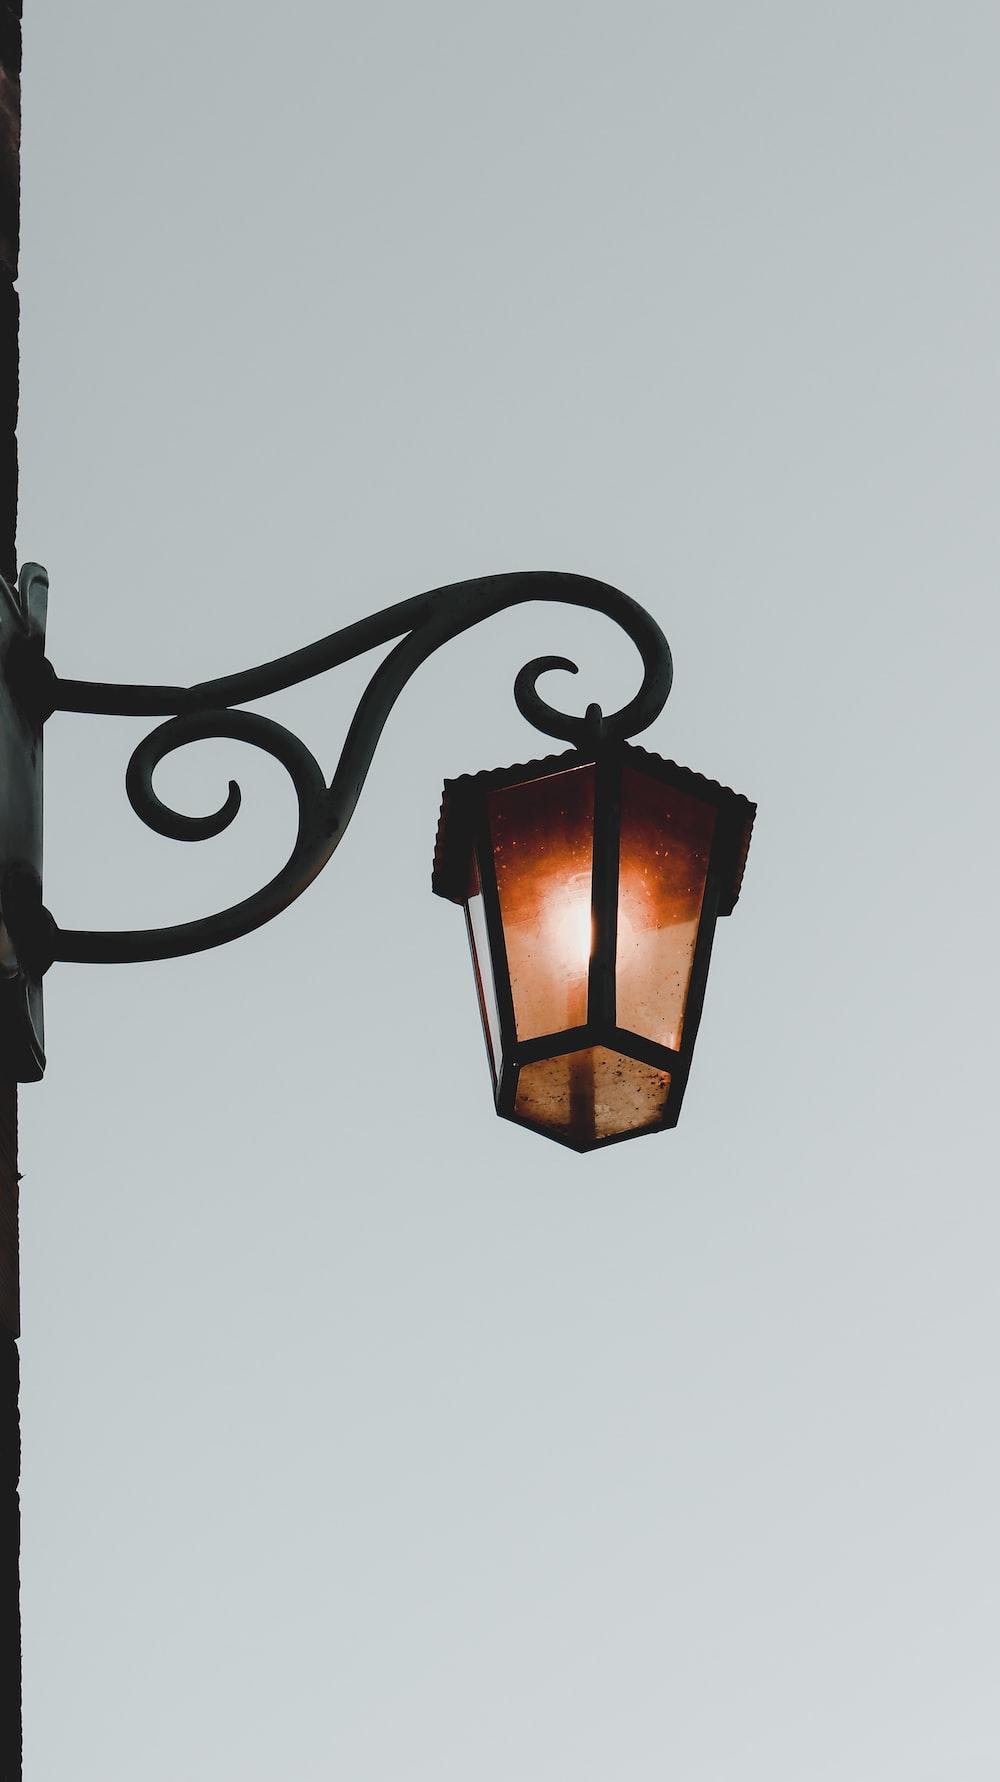 black metal frame lamp turned on during daytime